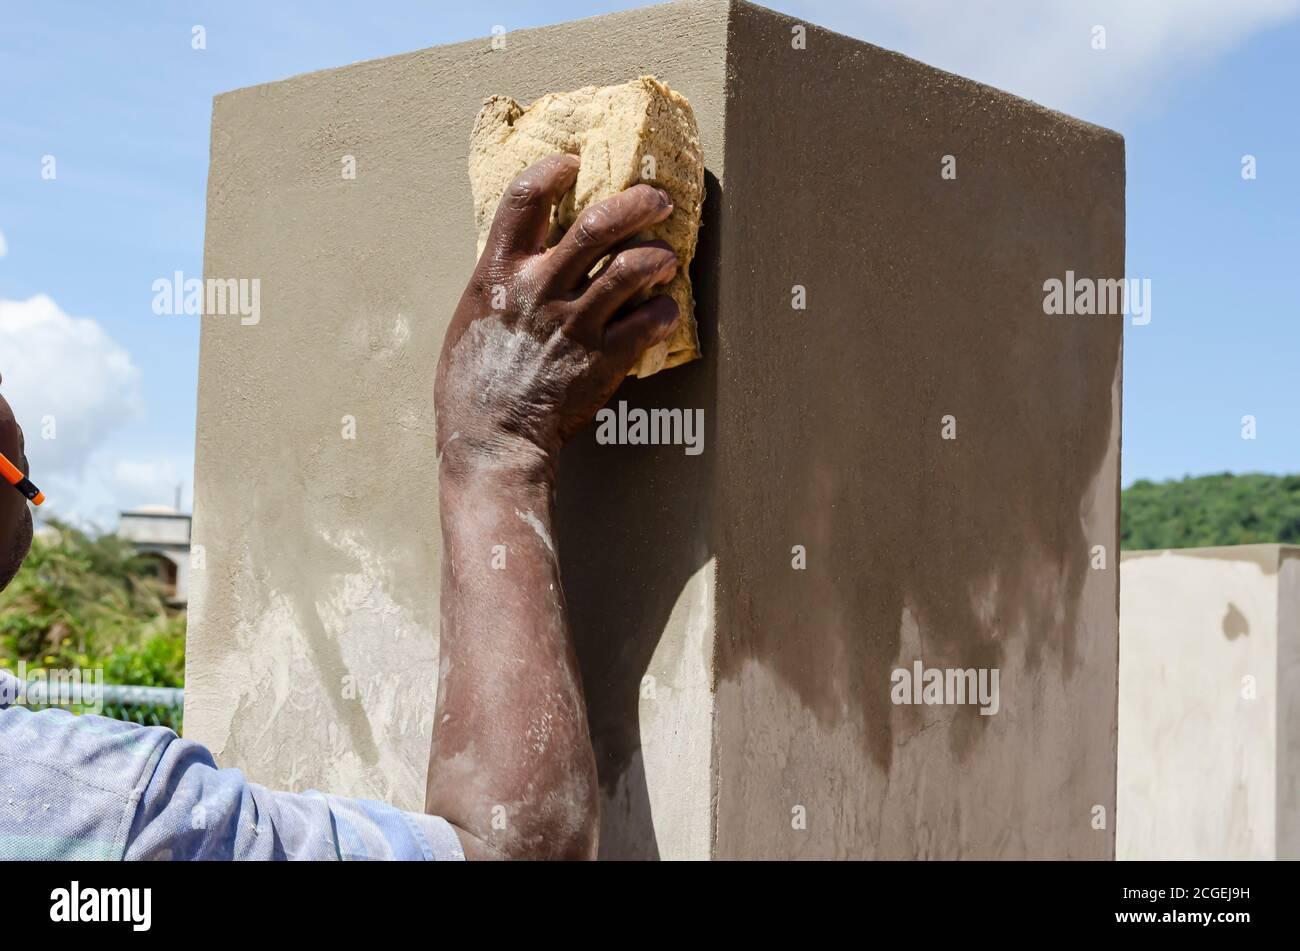 Workman Smoothing Concrete Wall Stock Photo